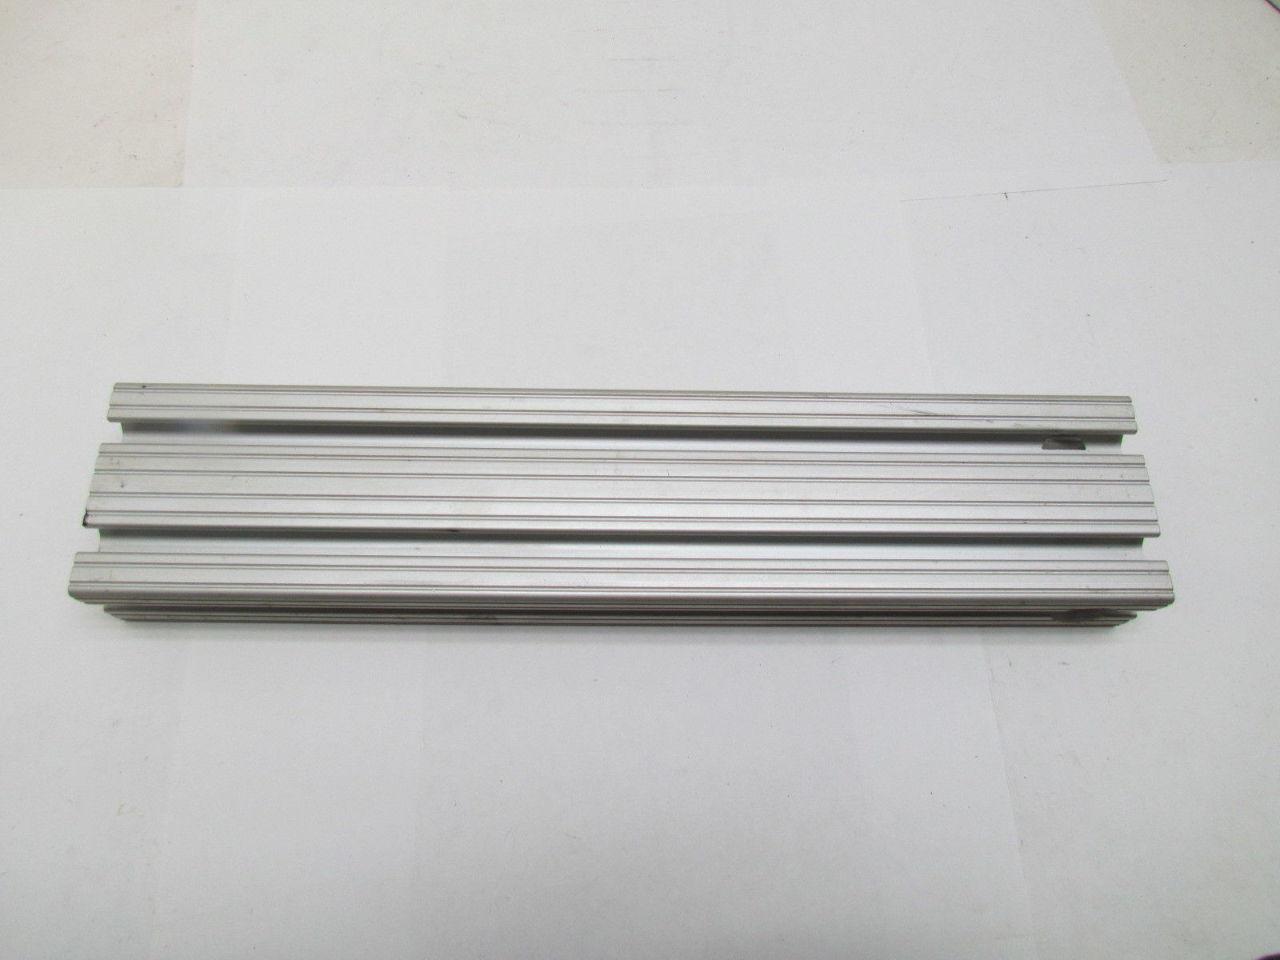 Od Aluminum Extrusions Aluminum Channel Quot Leg X 1 Quot Od X 3